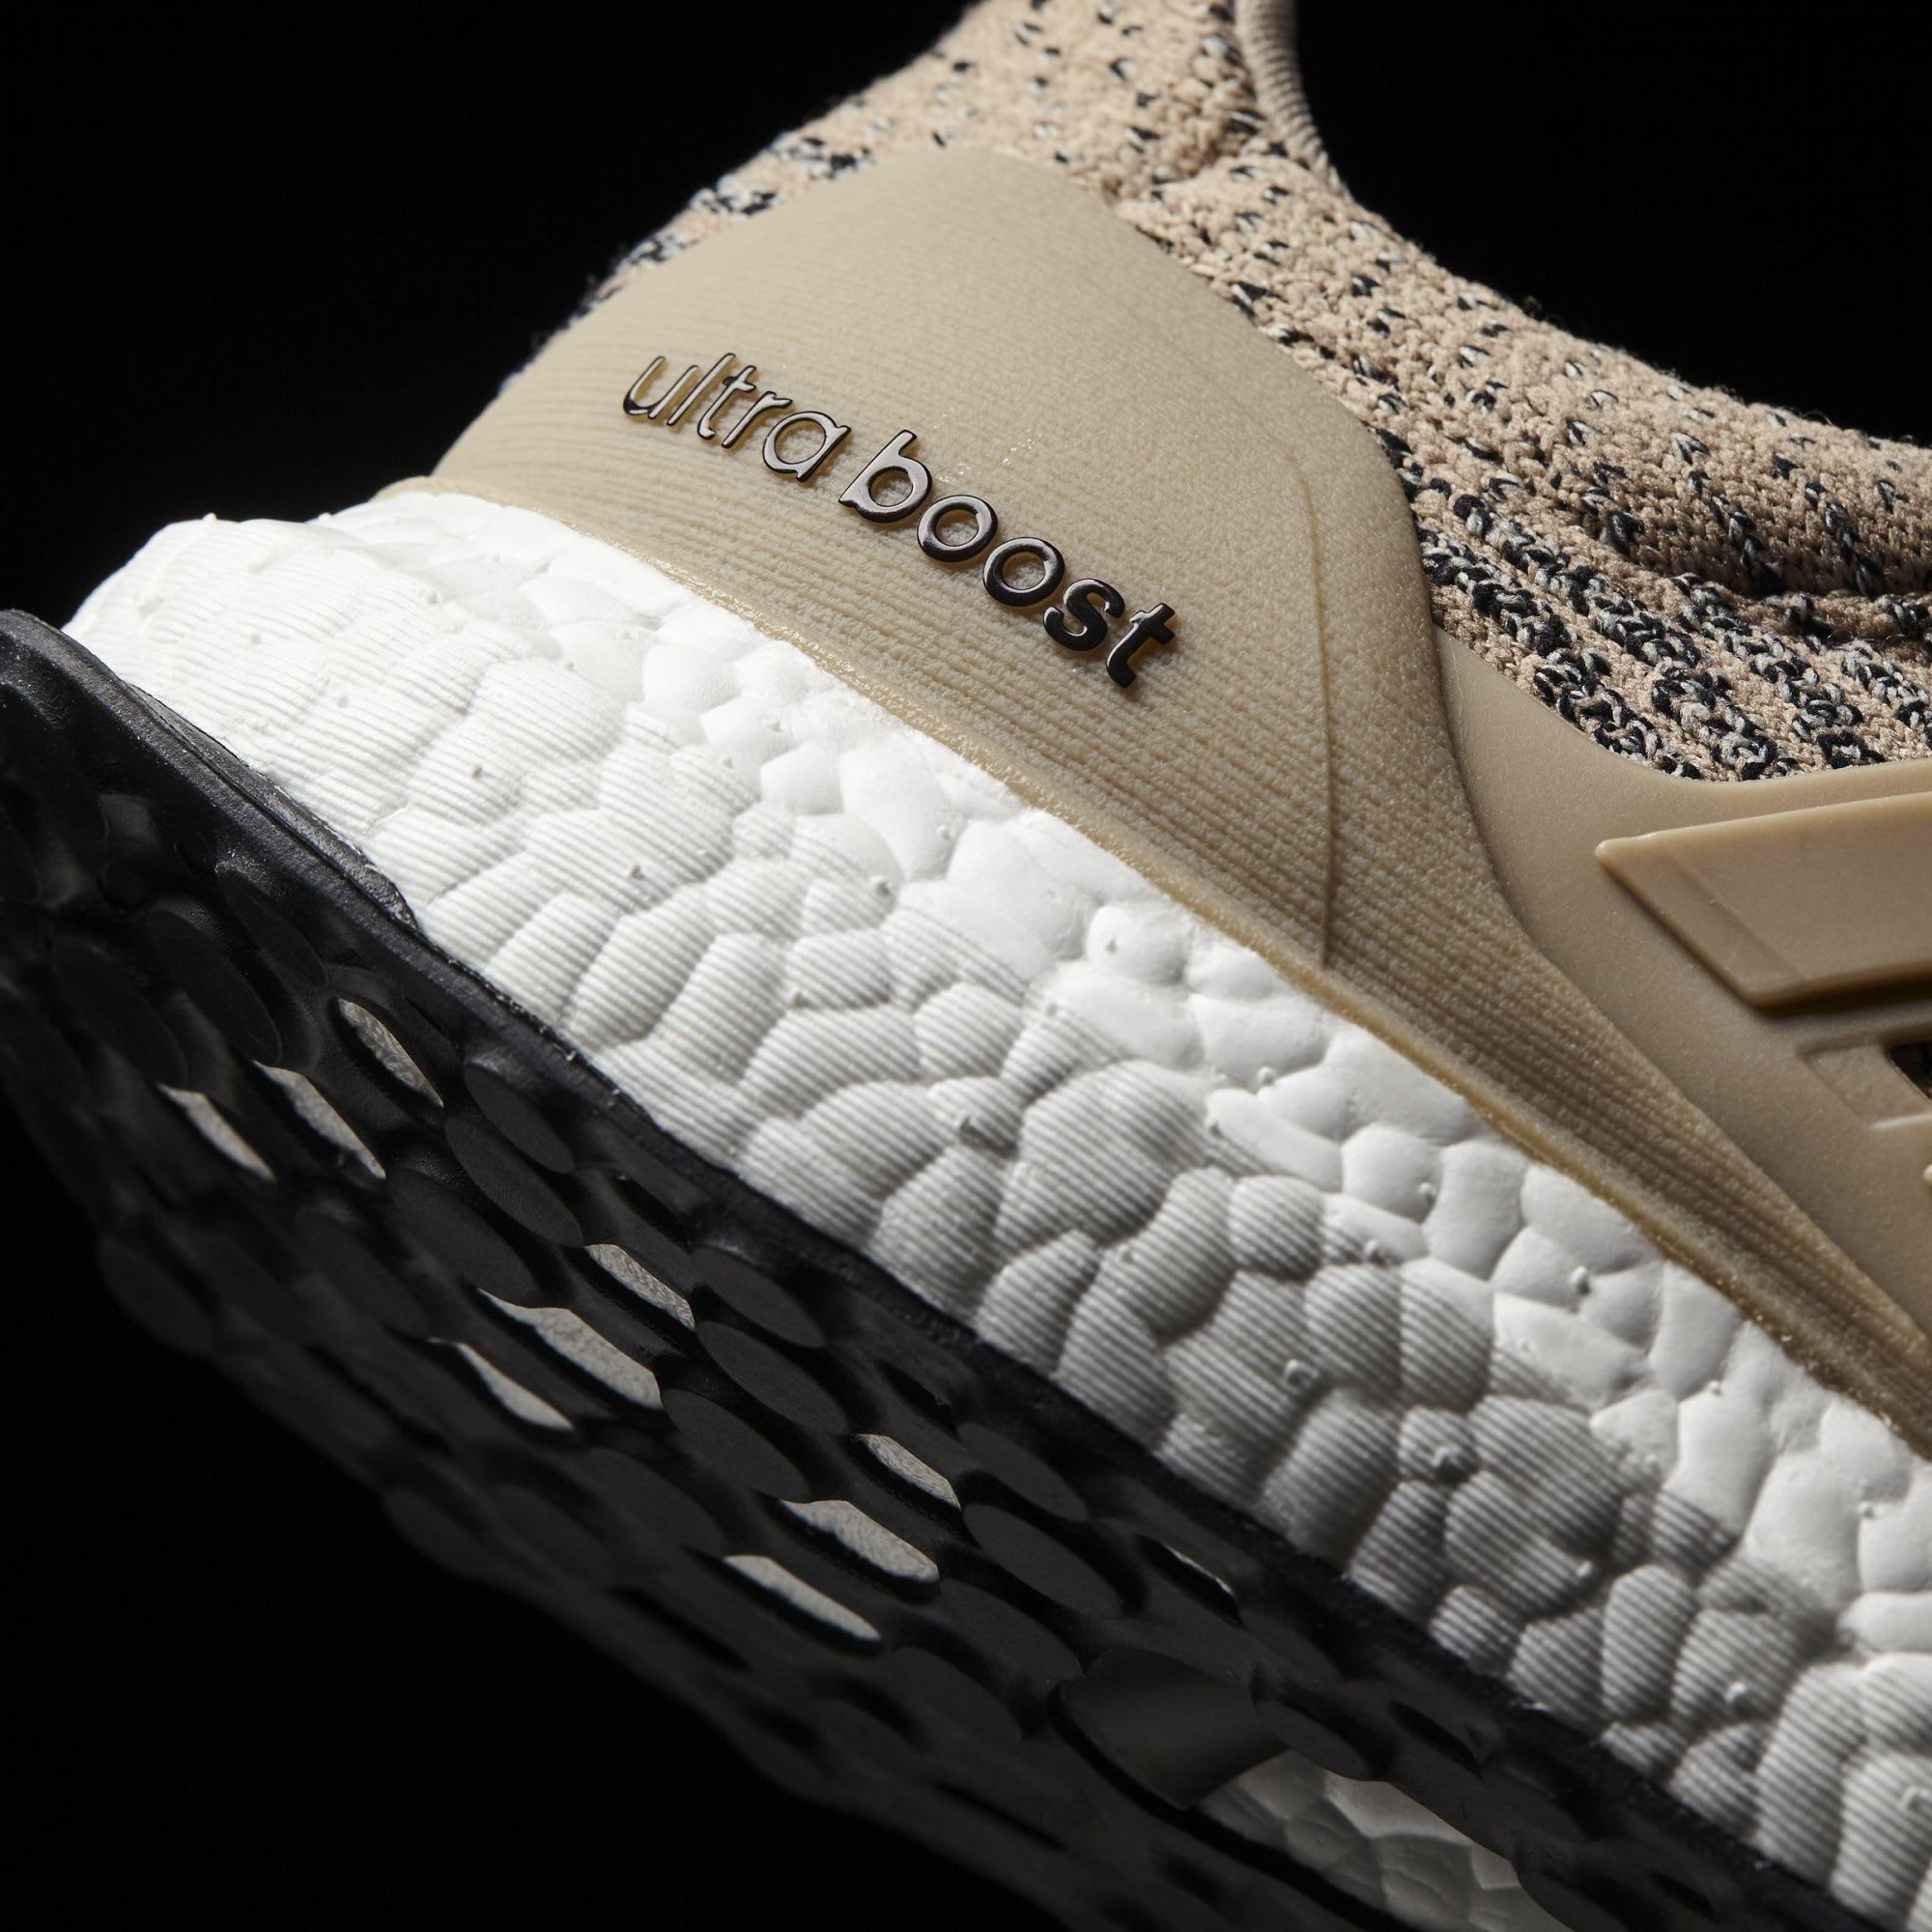 0031a8d970878 ... official adidas ultra boost 3.0 trace khaki release date midsole 0e9e8  03f79